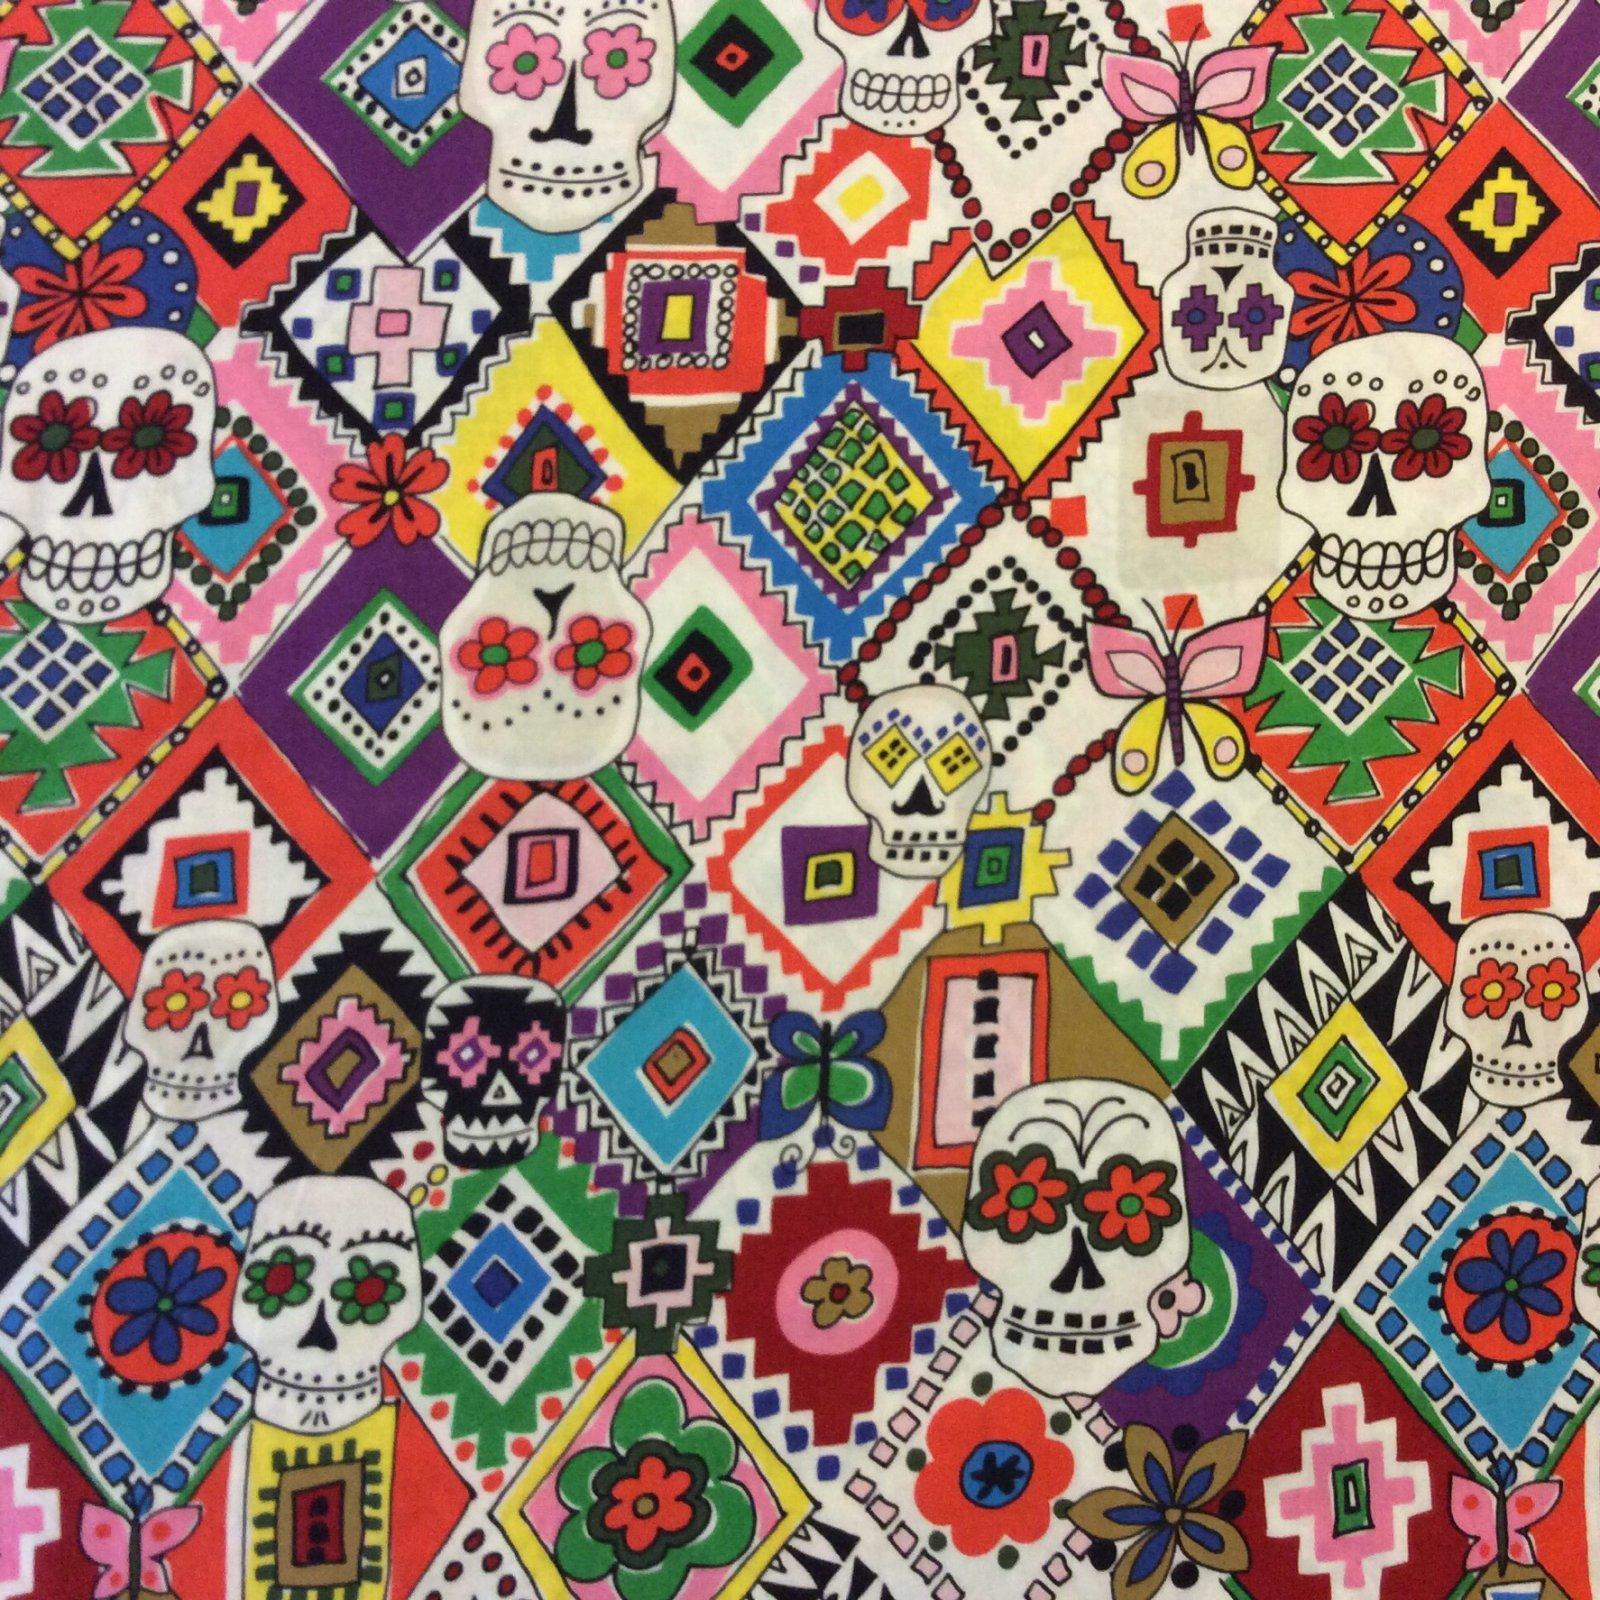 Dia de los Muertos Day of the Dead Aztec Mexico Sugar Skulls Cotton Quilt Fabric AH25